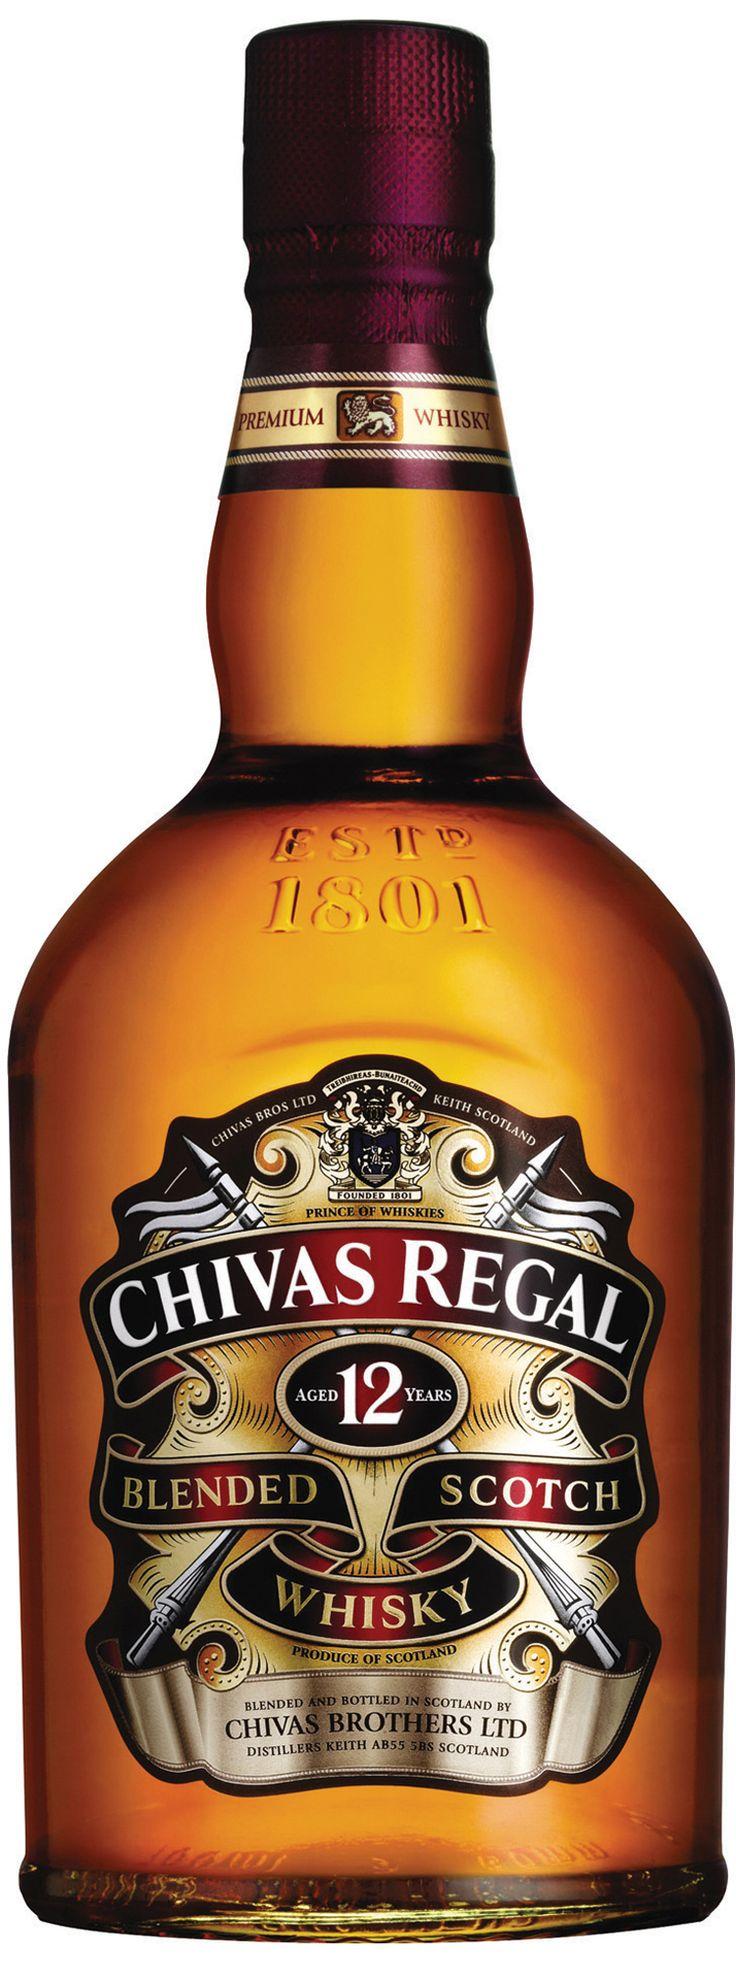 "Blended Scotch Whisky ""Chivas Regal 12 Years"" - Chivas Brothers Ltd, Escocia, UK"